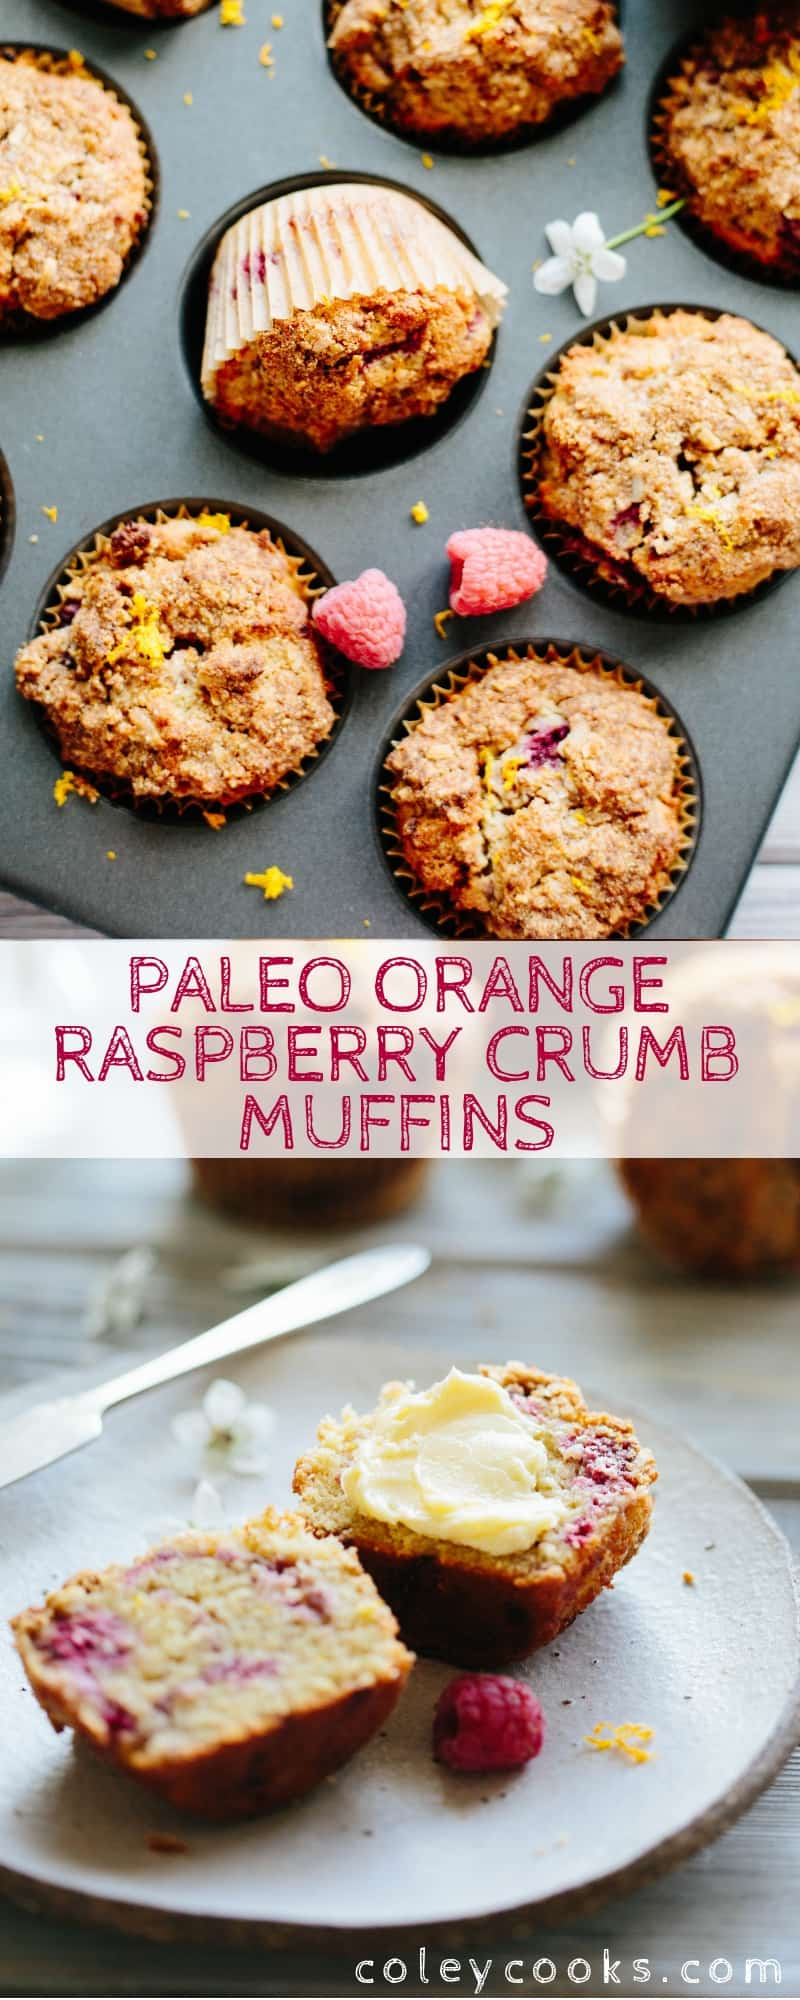 Pinterest collage of Paleo orange raspberry crumb muffin recipe.